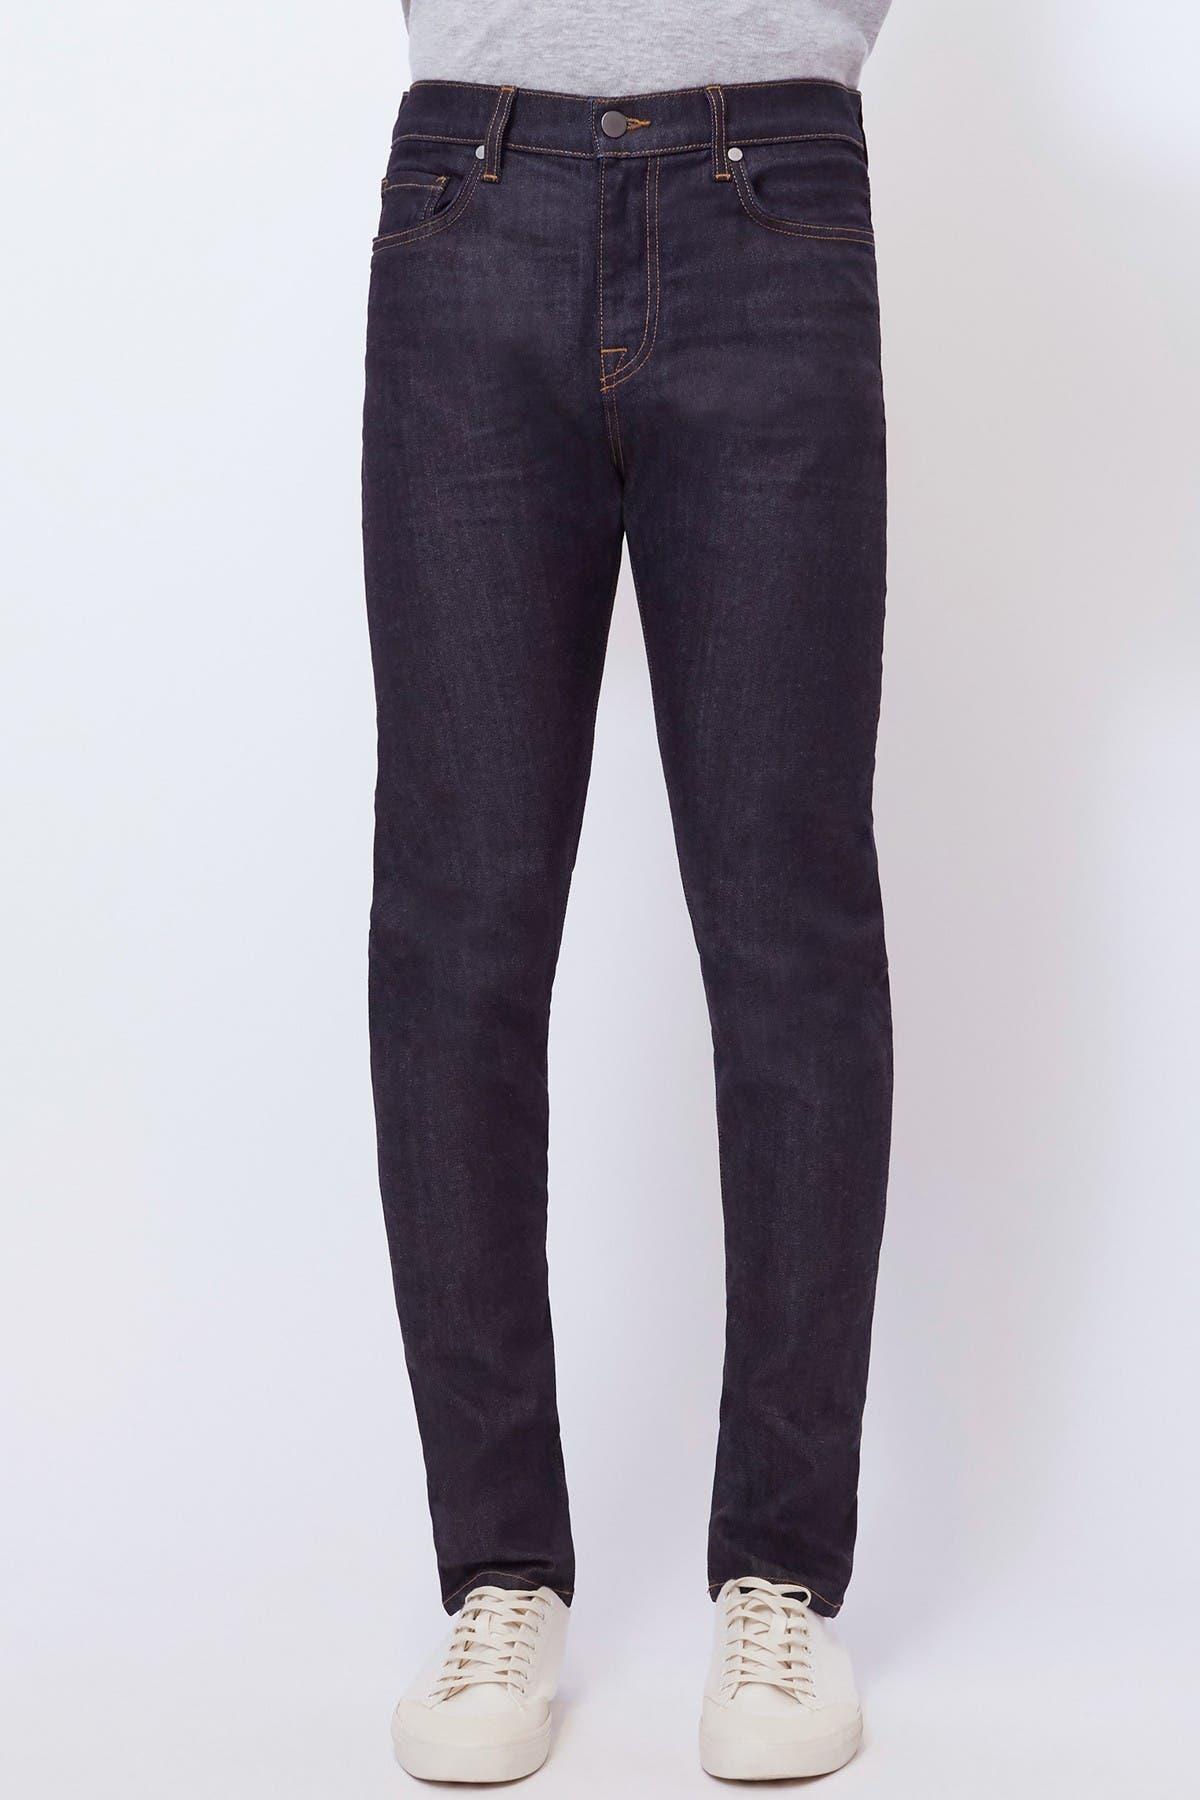 Image of BALDWIN Modern Skinny Jeans